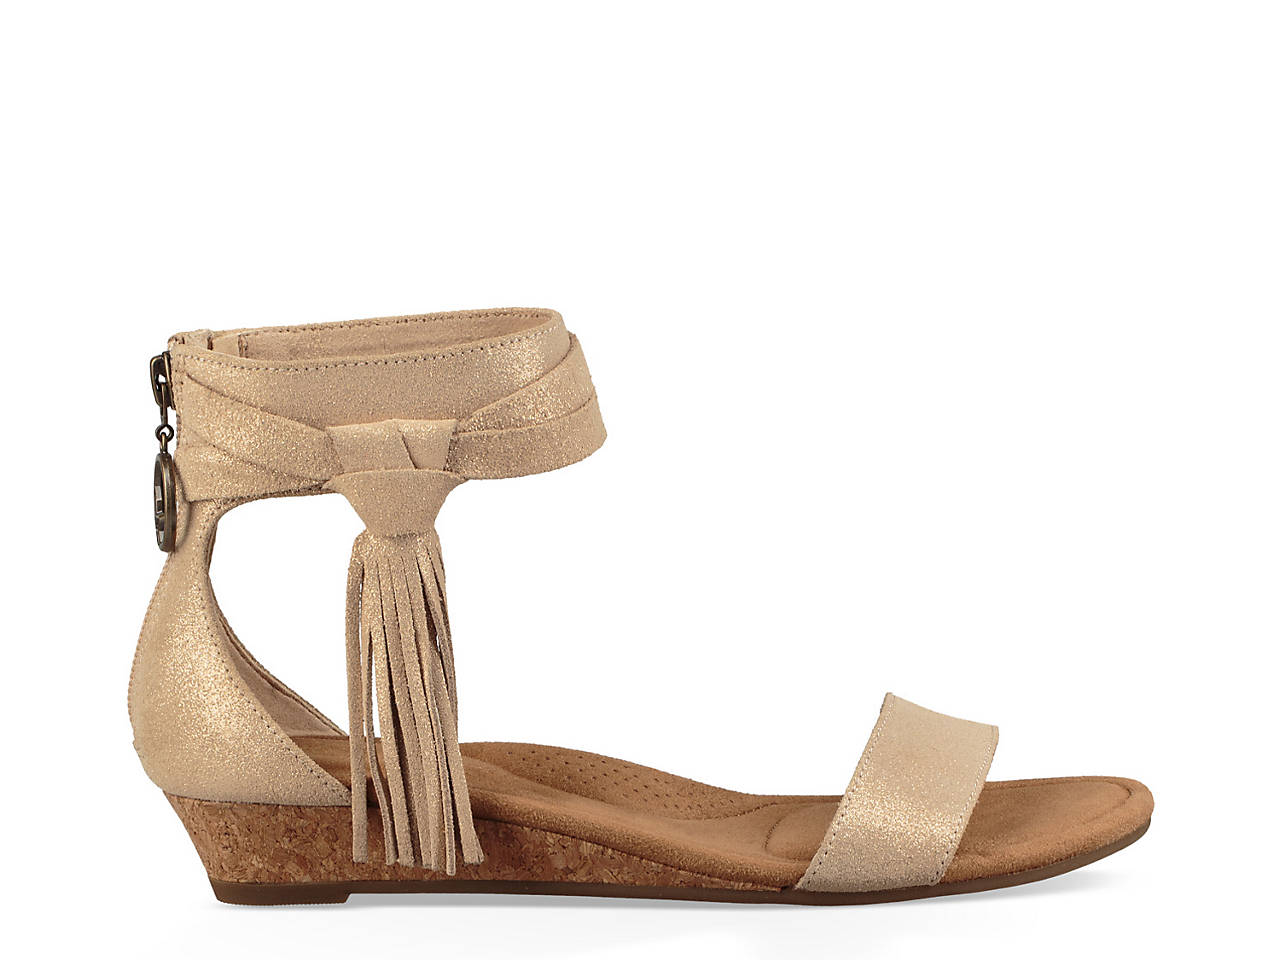 449c7890a0c4 Koolaburra by UGG Saige Wedge Sandal Women s Shoes